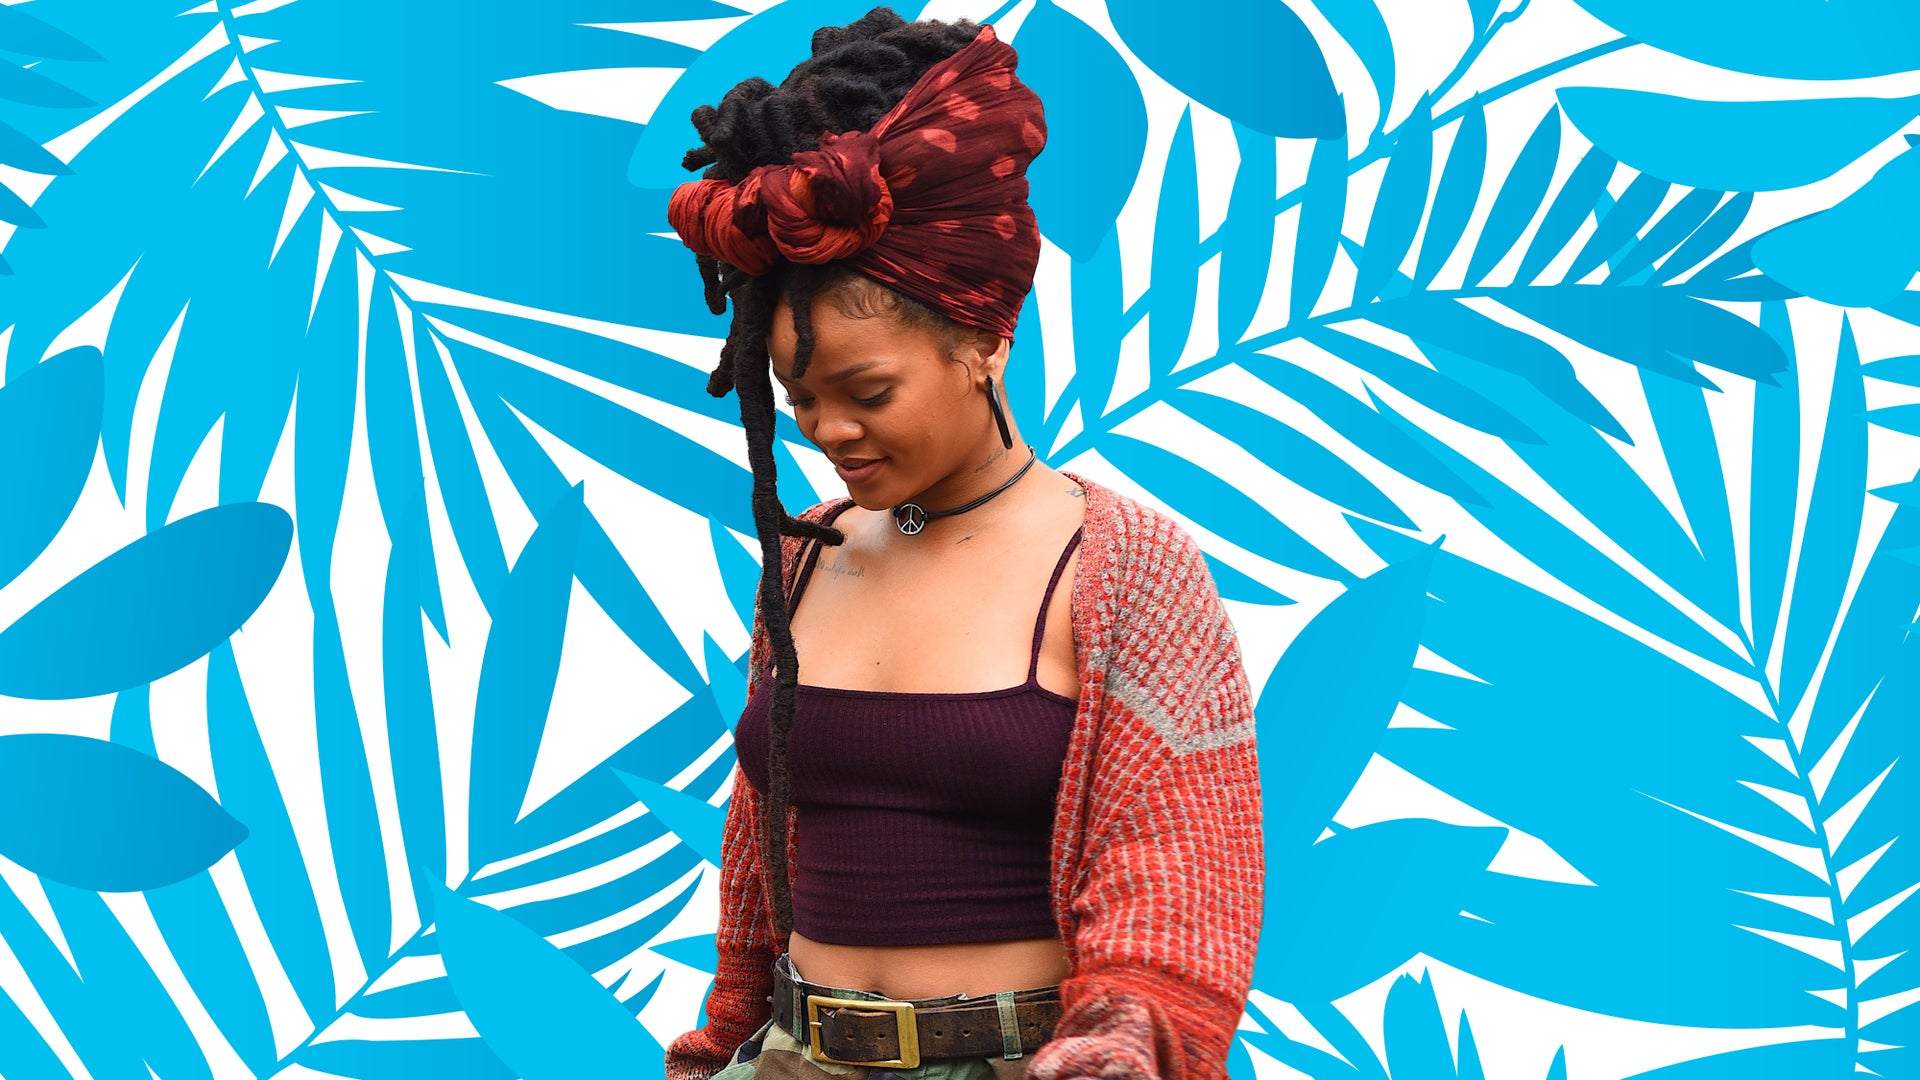 Rihanna Makes a Basic Hair Accessory Look Luxe on the Set of 'Ocean's 8'